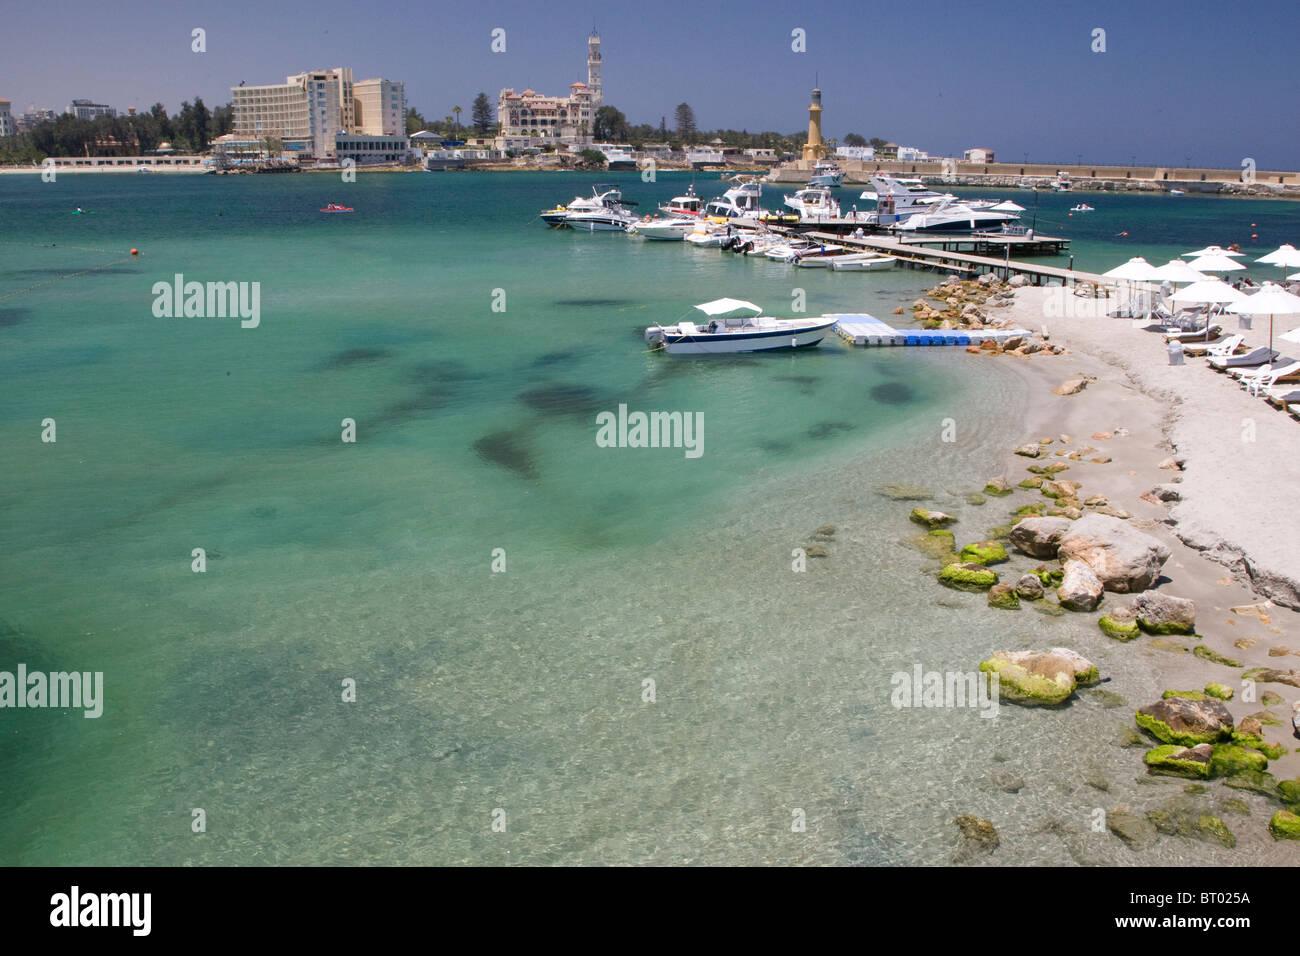 Alexandria Egypt Africa Outdoor City Famous City Tourist Resort Stock Photo Alamy